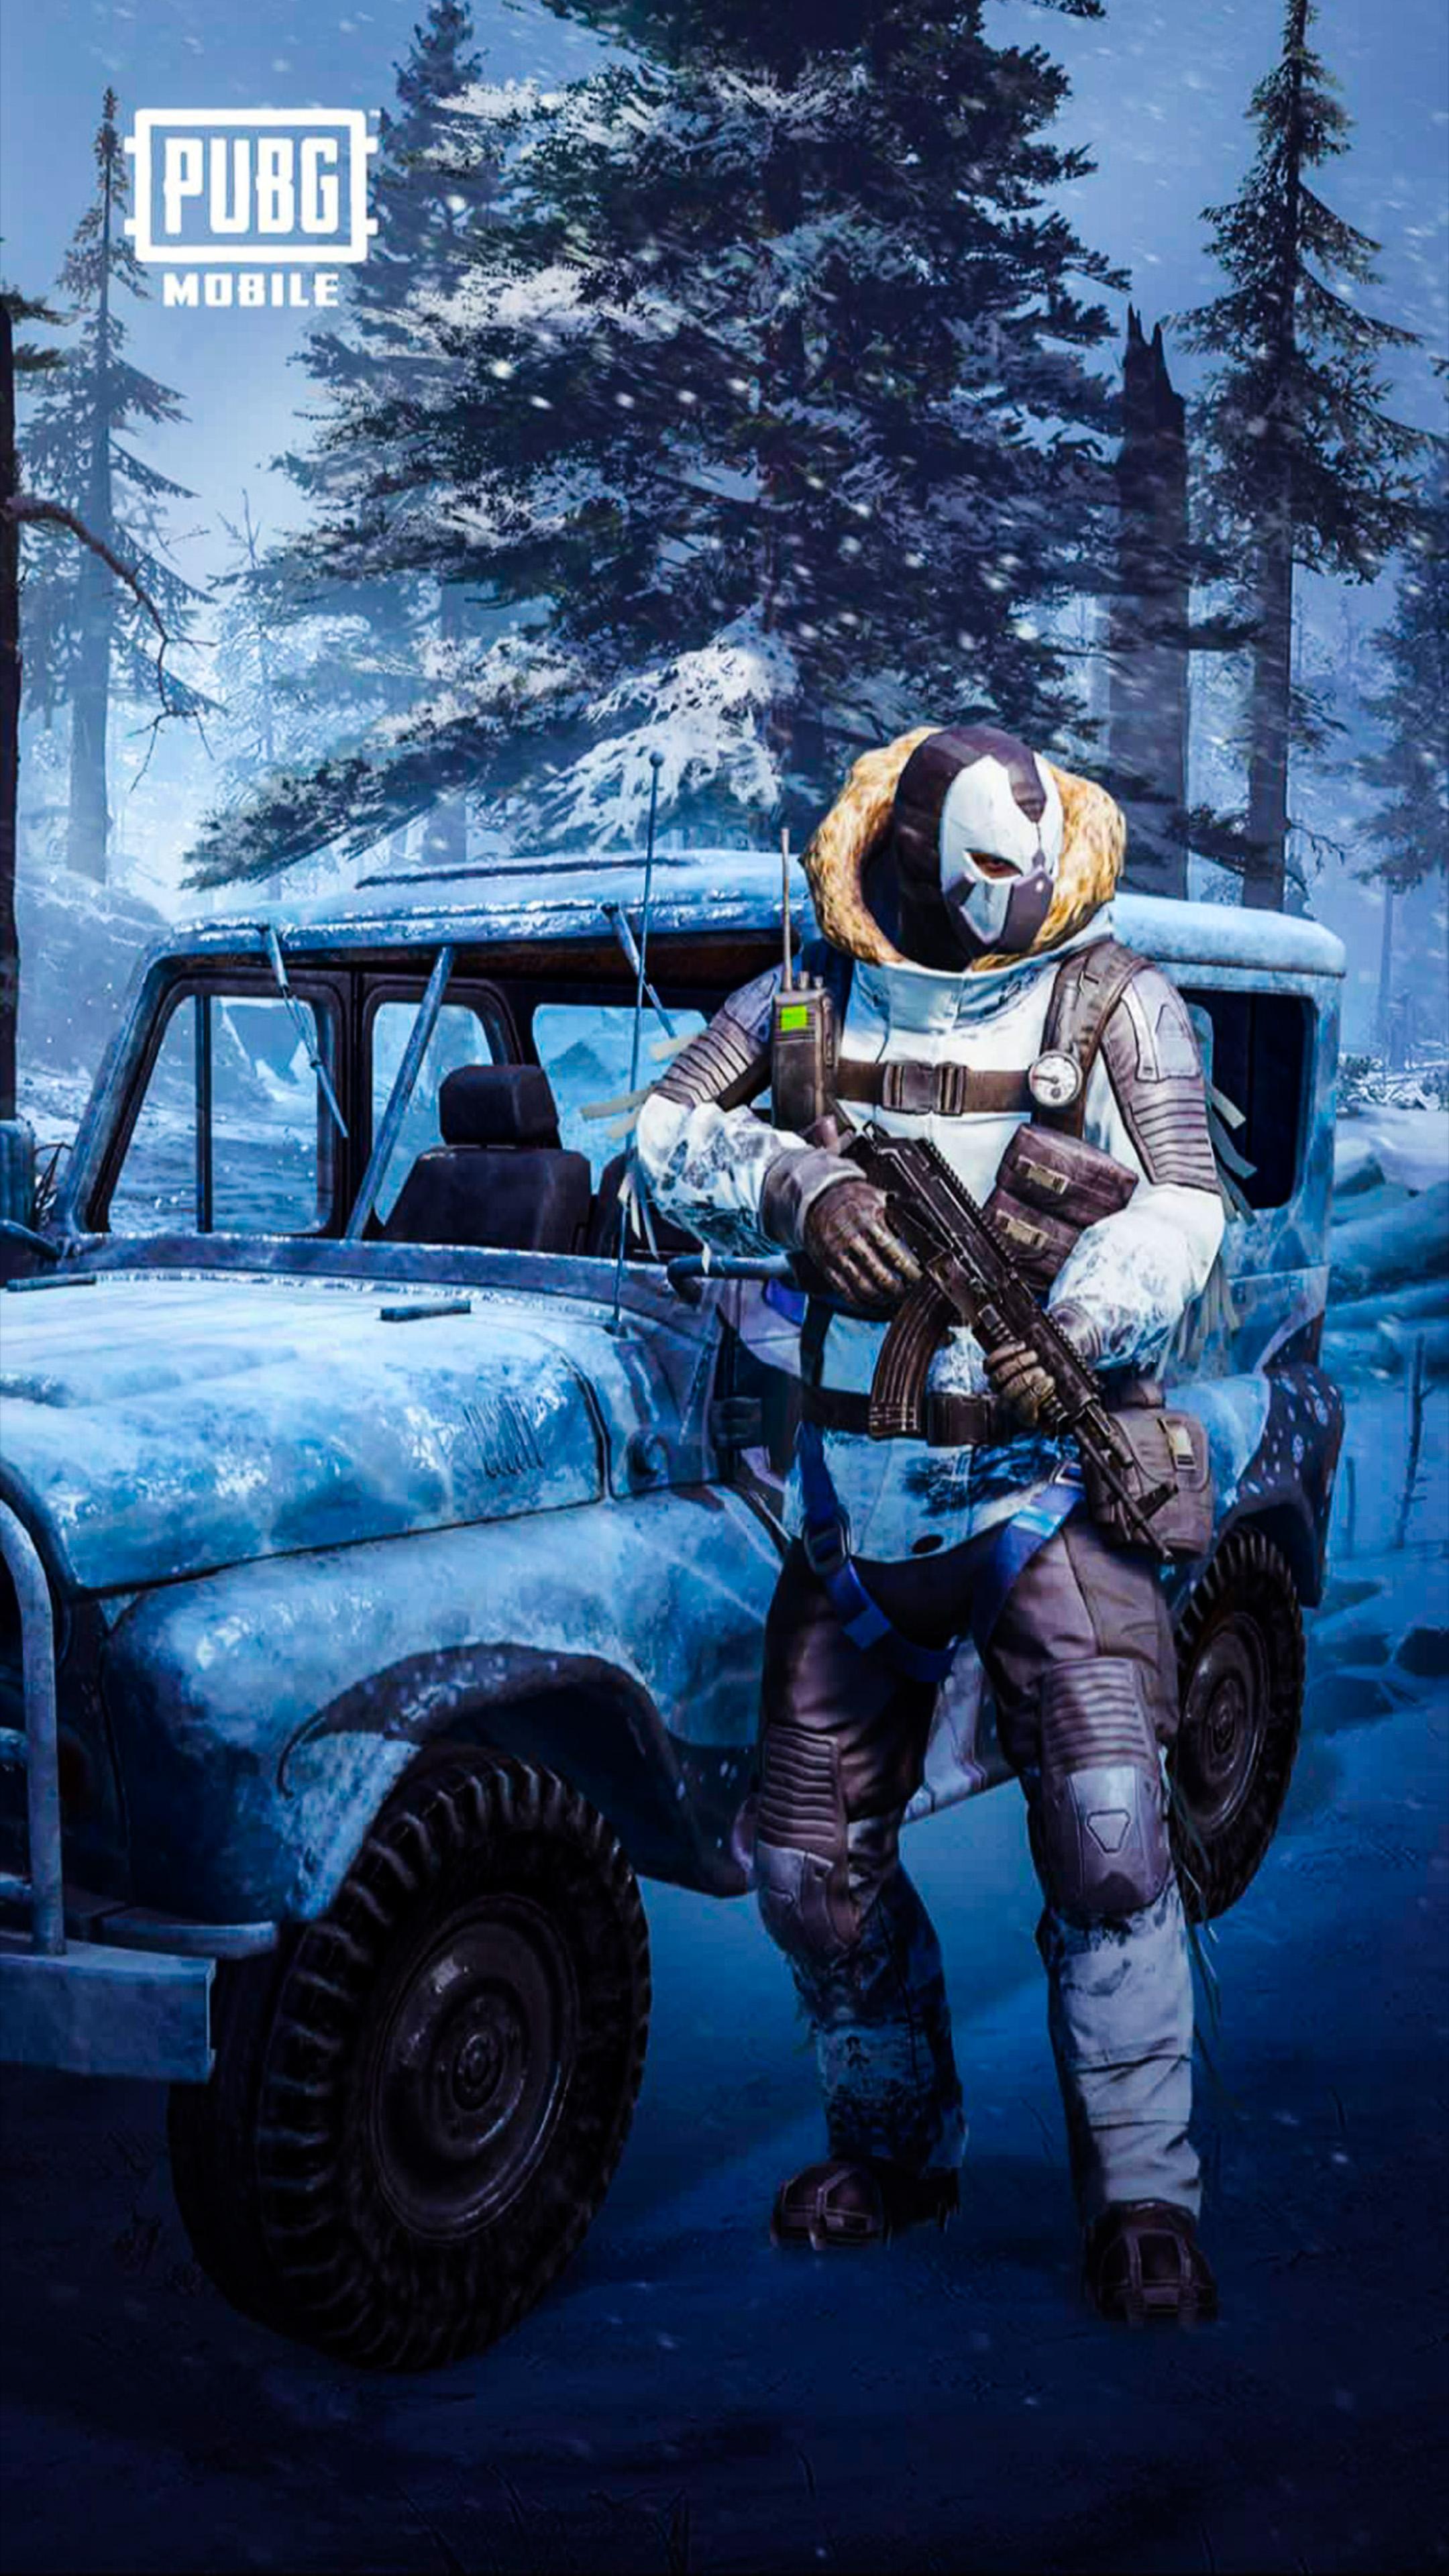 Download Pubg Mobile Snowman Free Pure 4k Ultra Hd Mobile